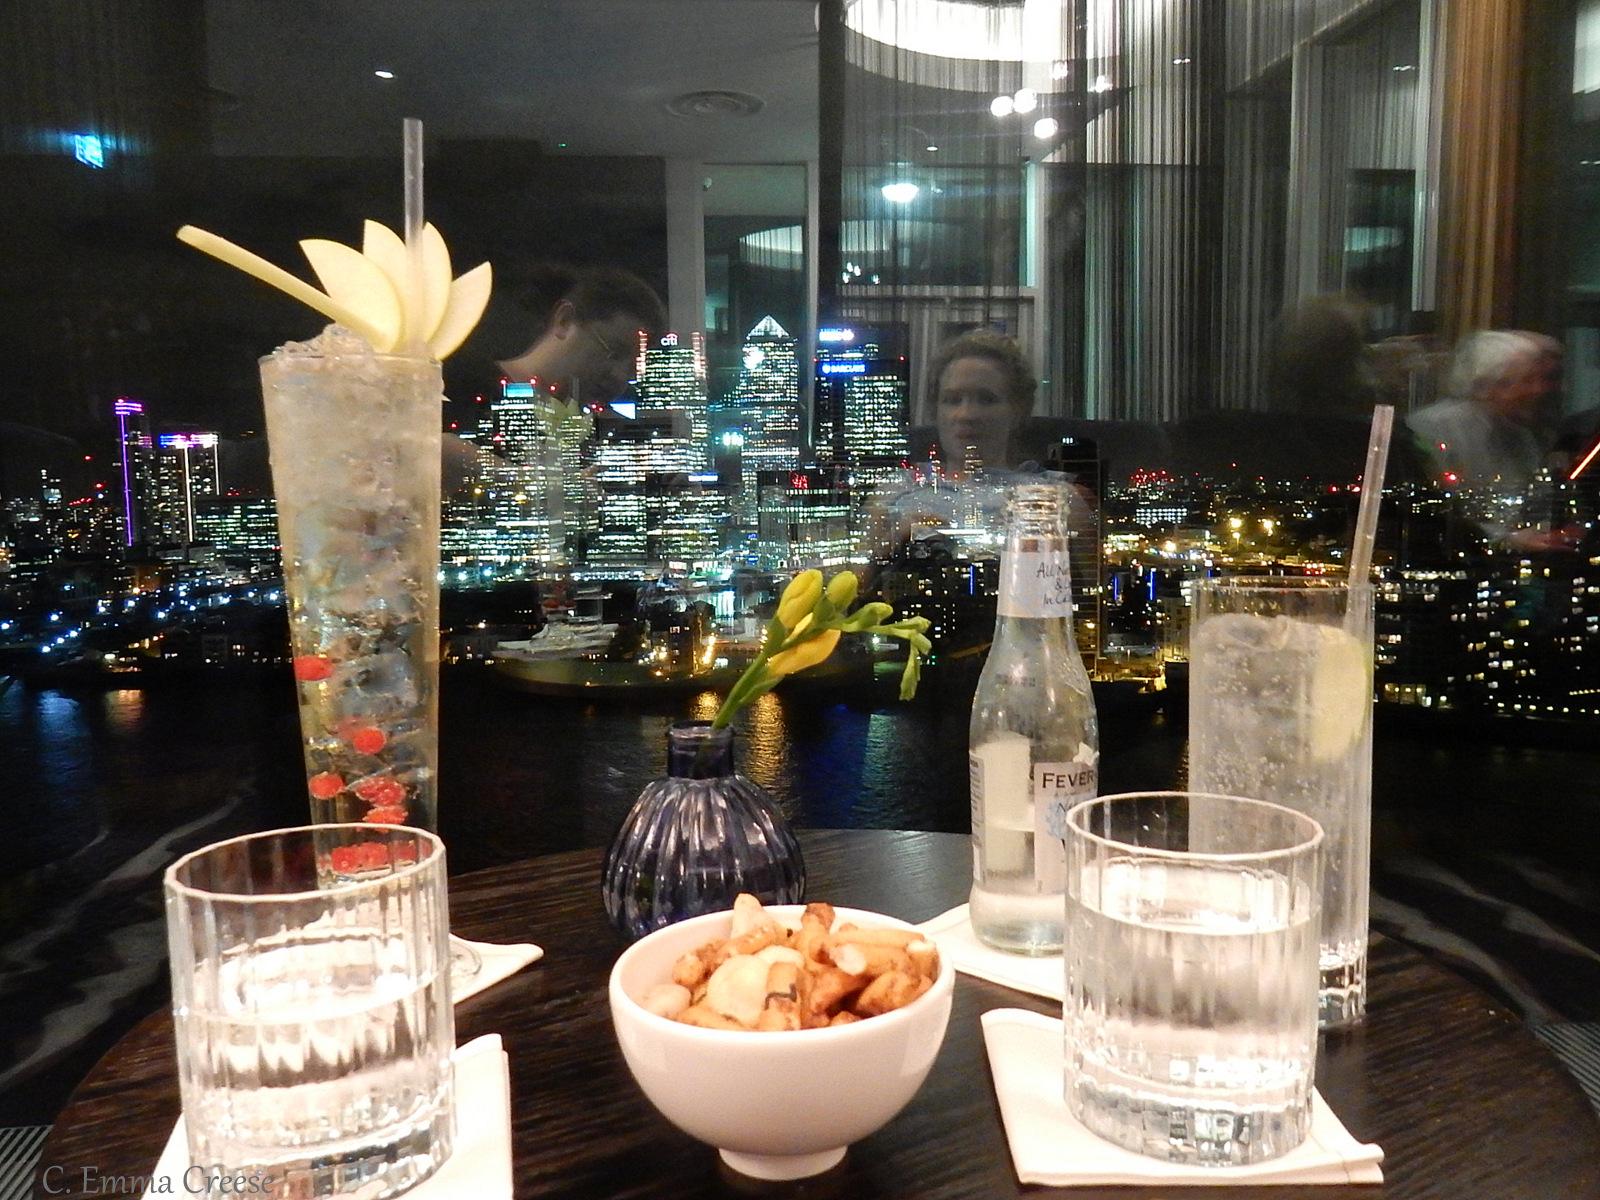 Peninsula Restaurant at the Intercontinental Hotel: A girl's night